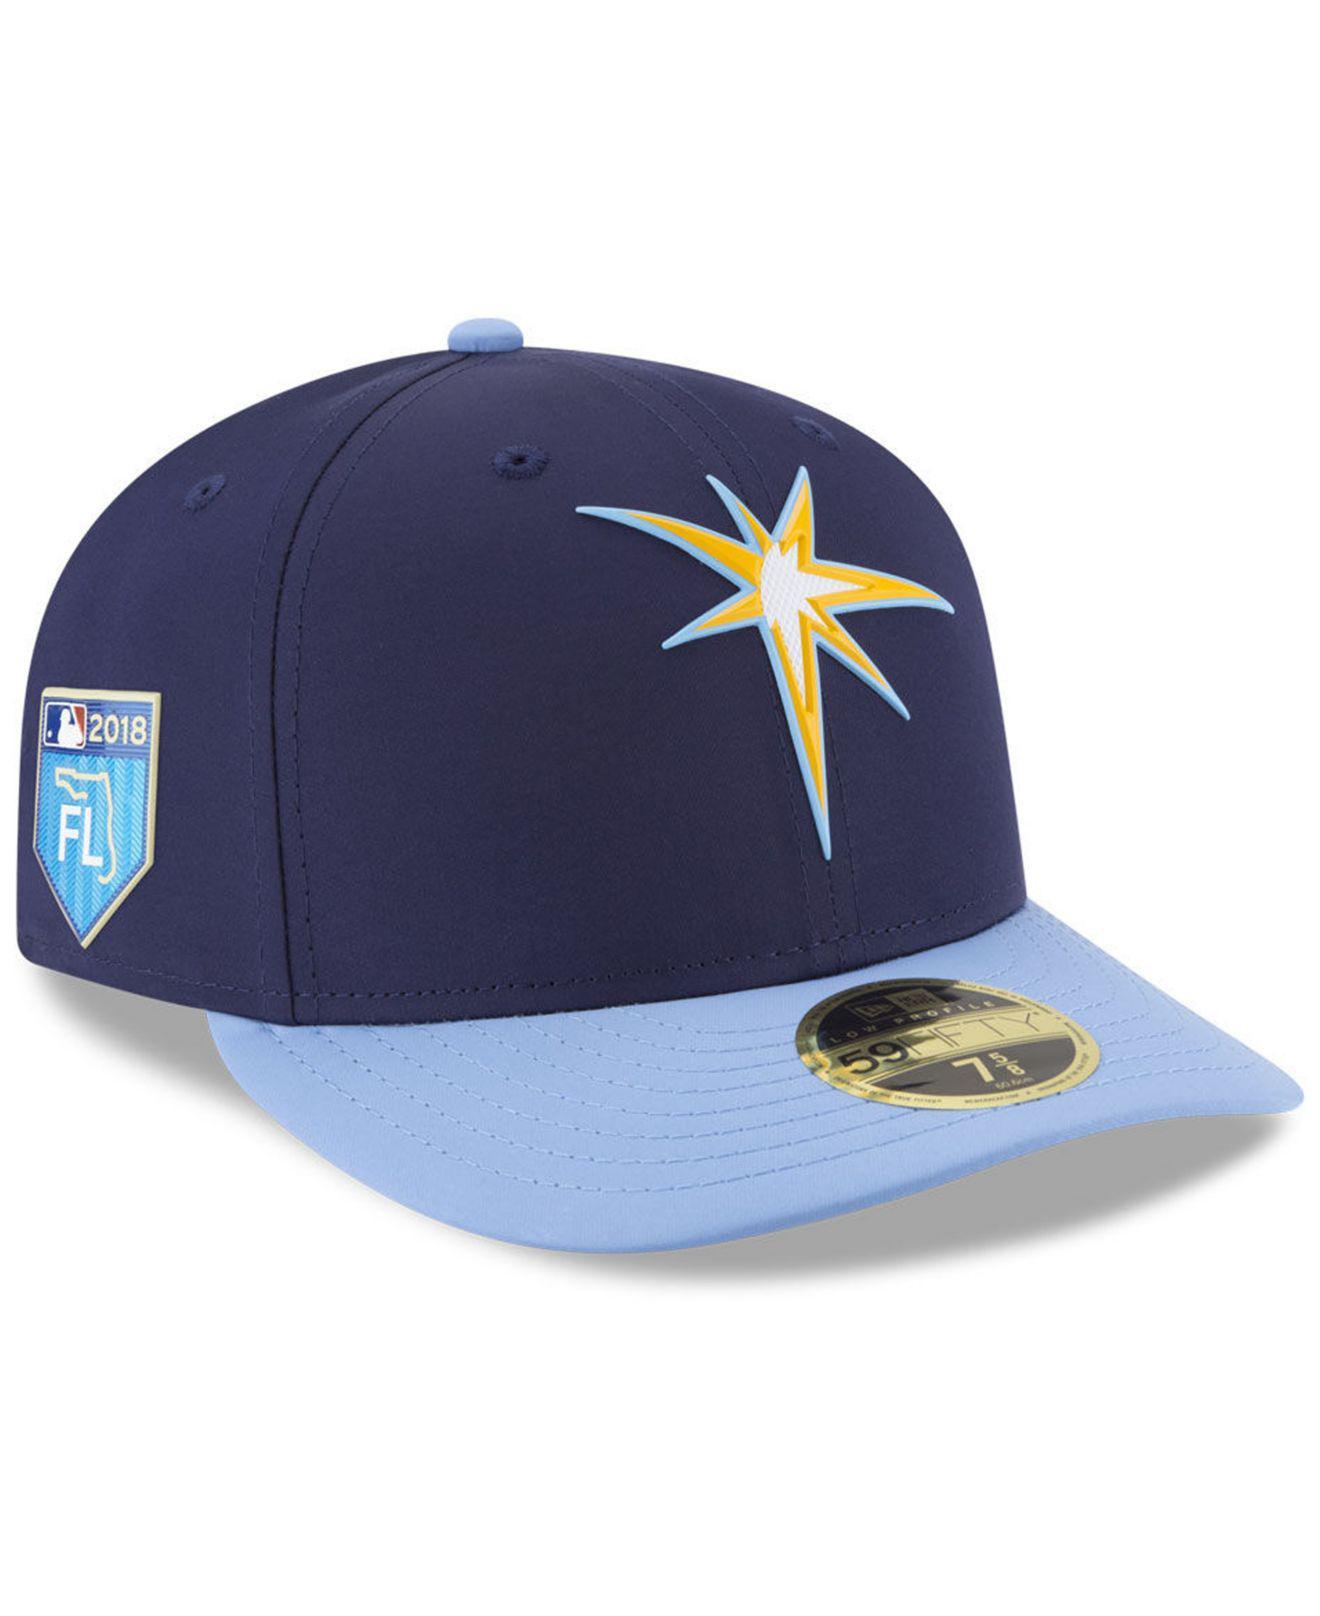 promo code 46dd9 7b532 switzerland new era tampa bay rays navy light blue 2019 batting practice  alternate 39thirty flex hat 86bf1 806f7  50% off ktz. mens blue tampa bay  rays low ...